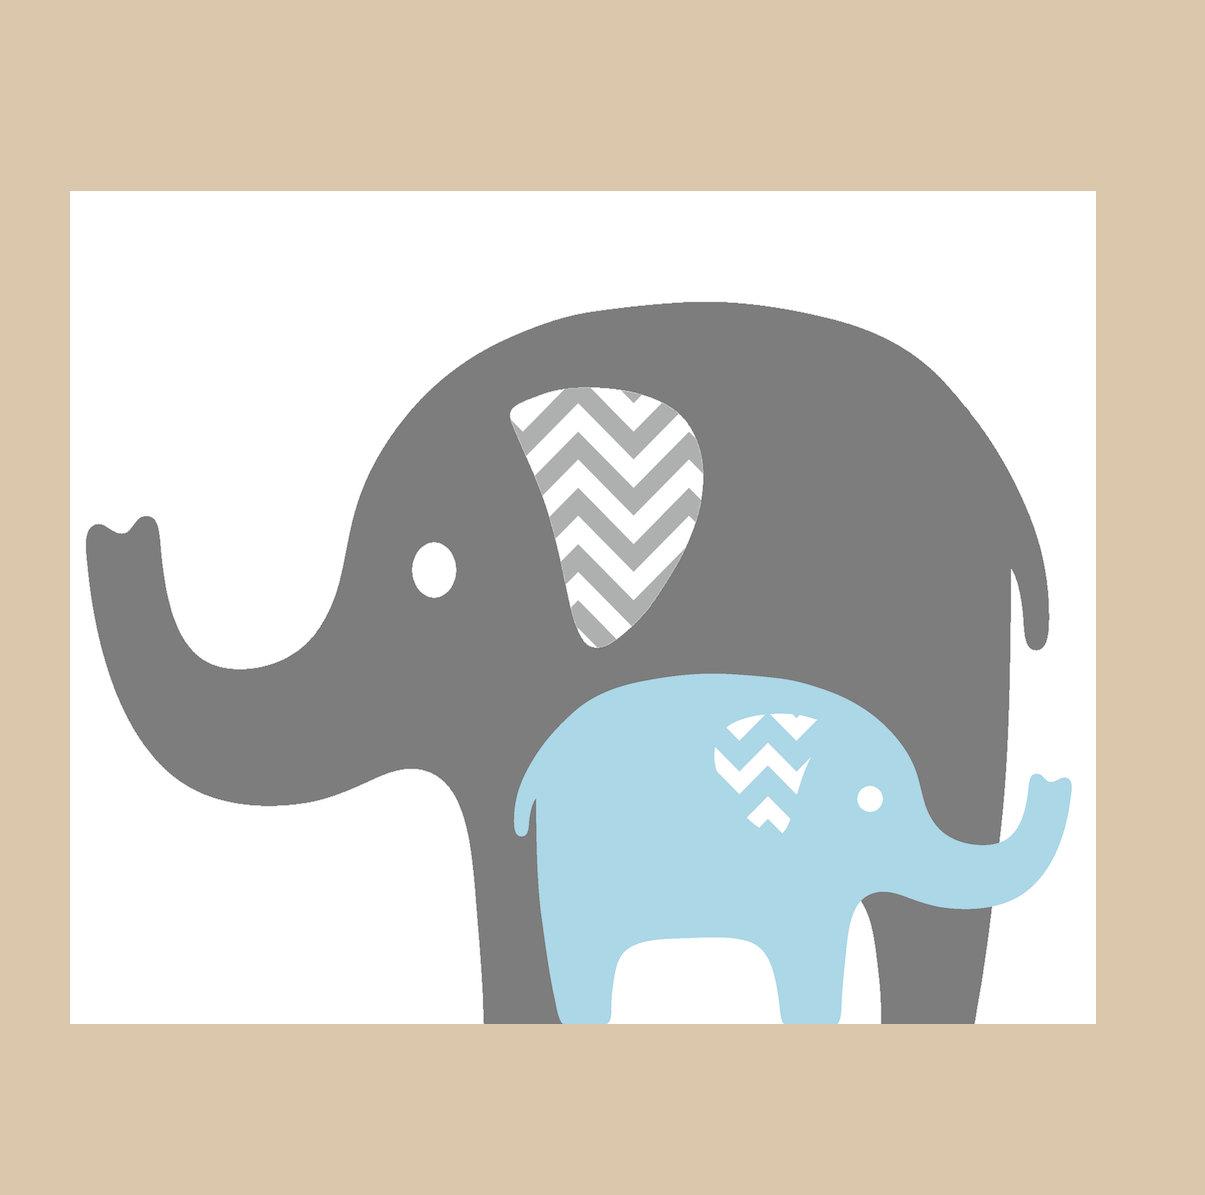 Blue and gray elephant clipart jpg royalty free library Free Baby Elephant Cliparts, Download Free Clip Art, Free Clip Art ... jpg royalty free library